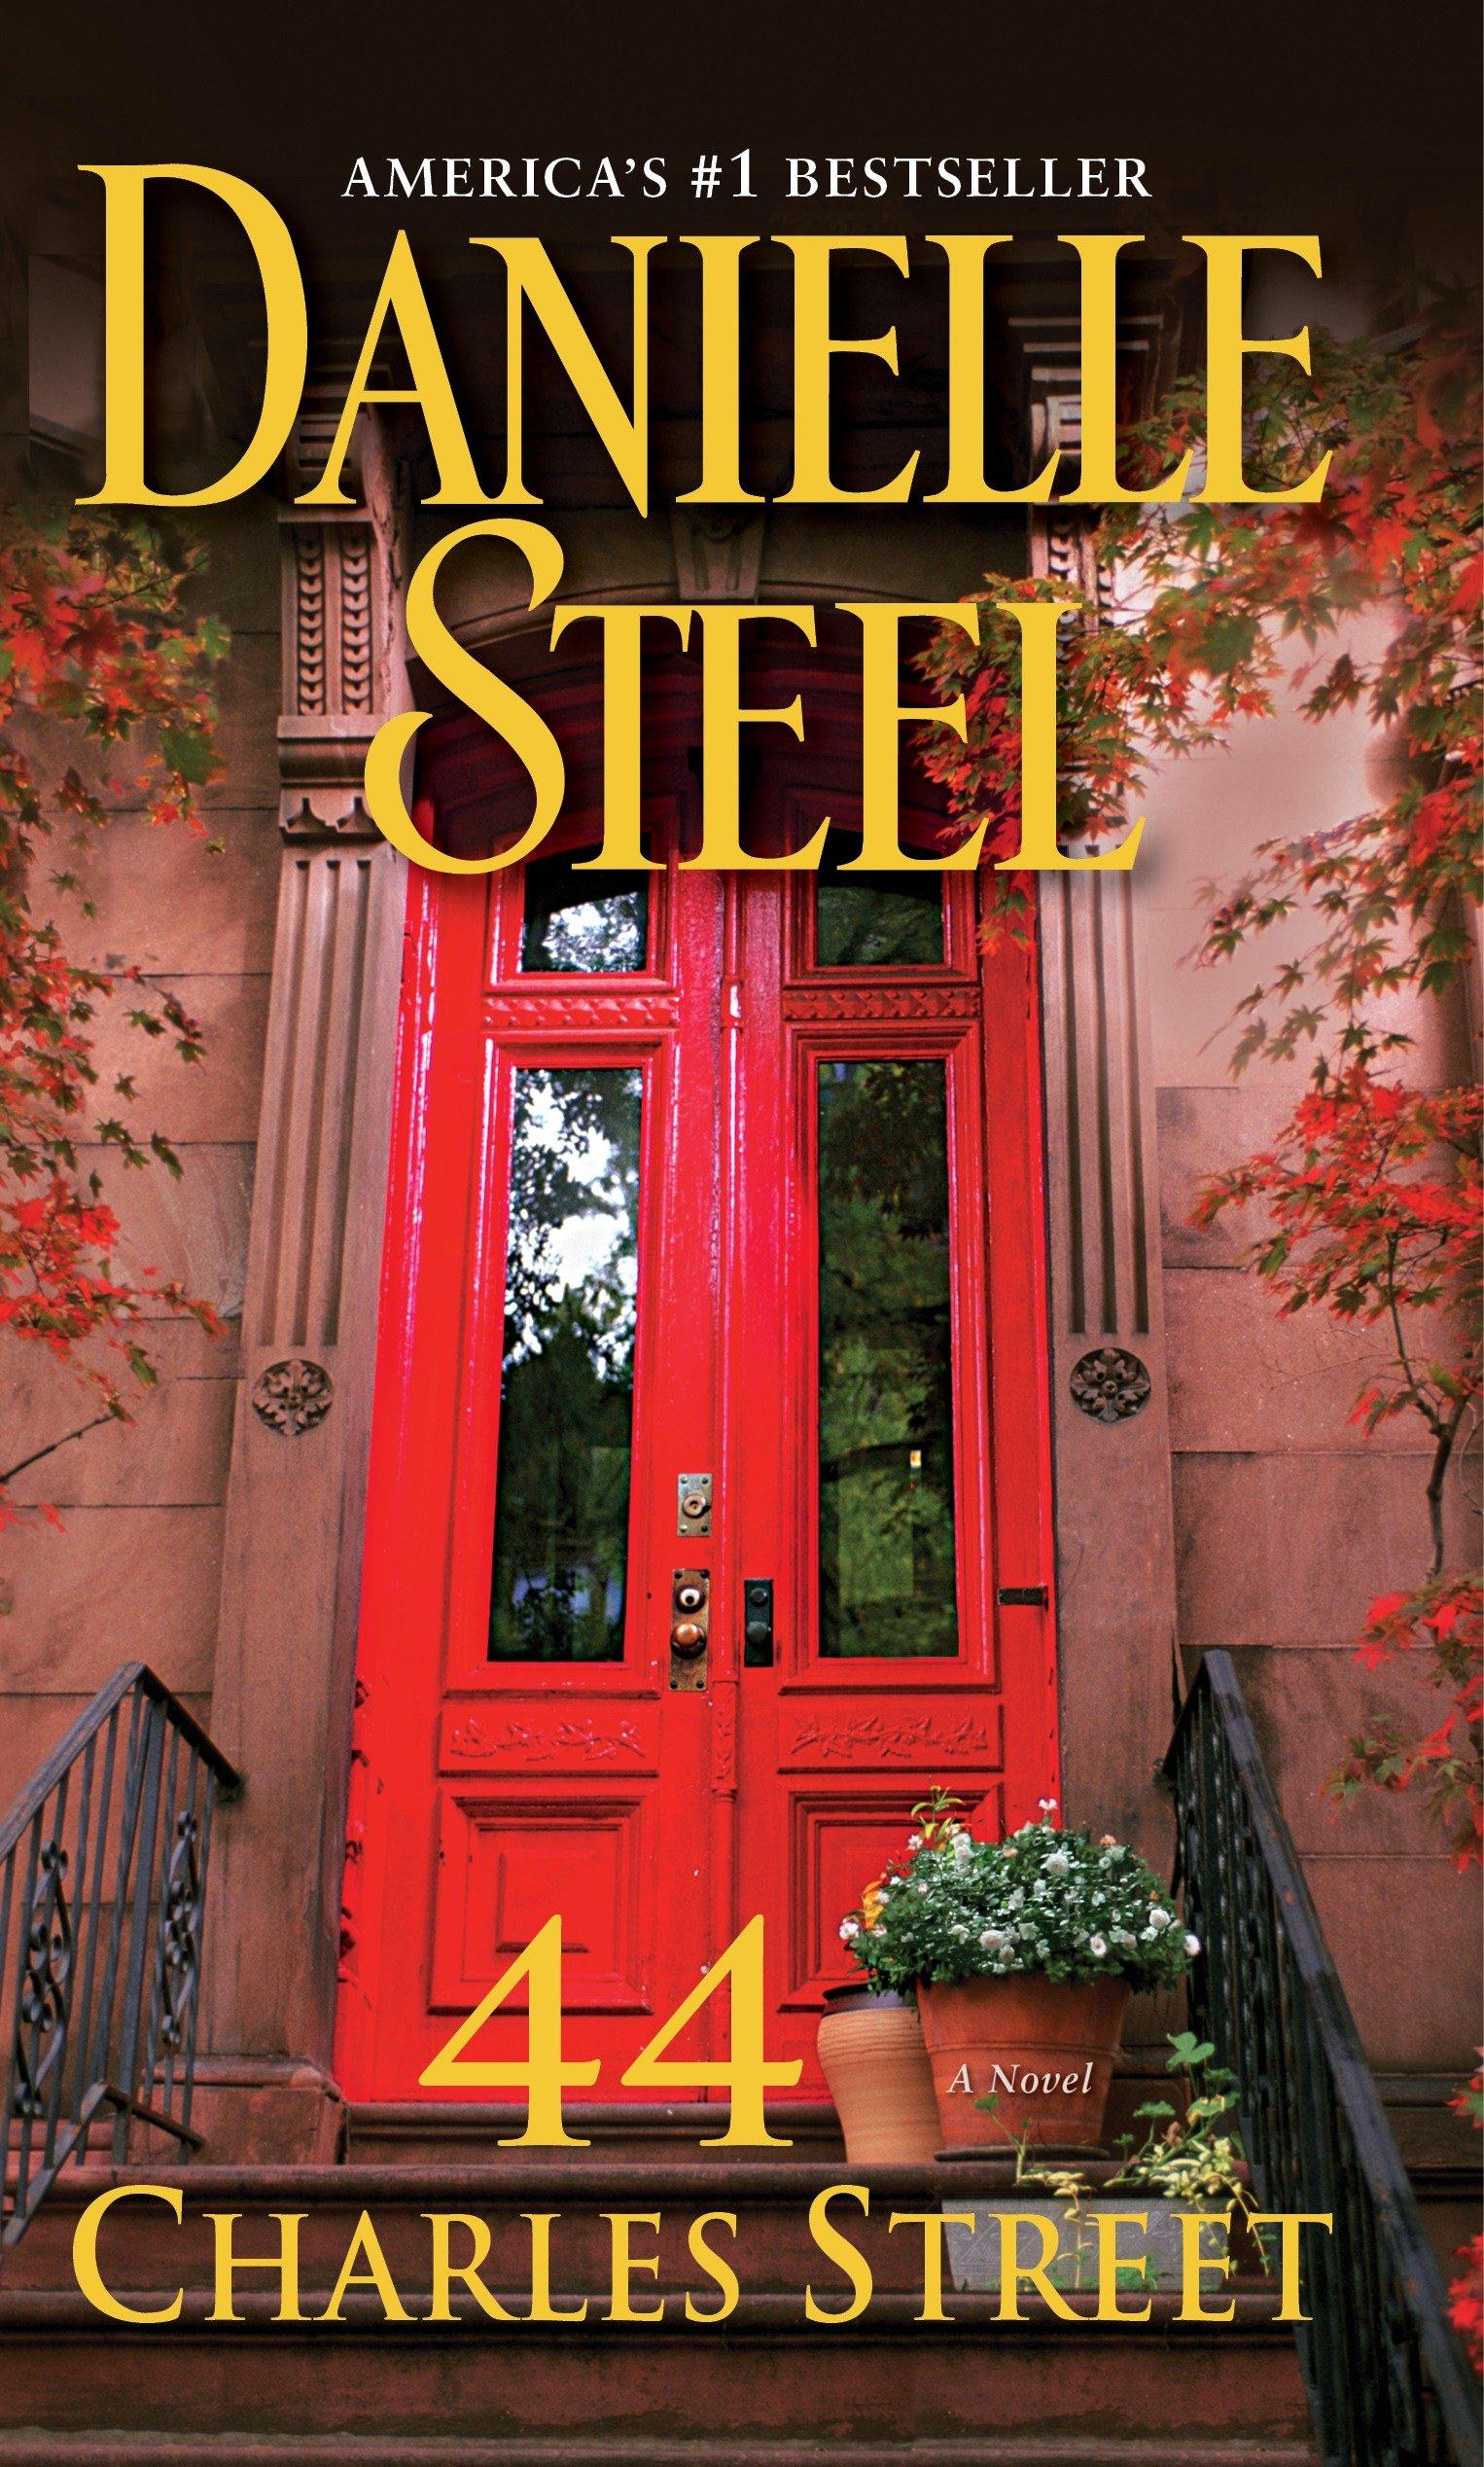 44 Charles Street A Novel